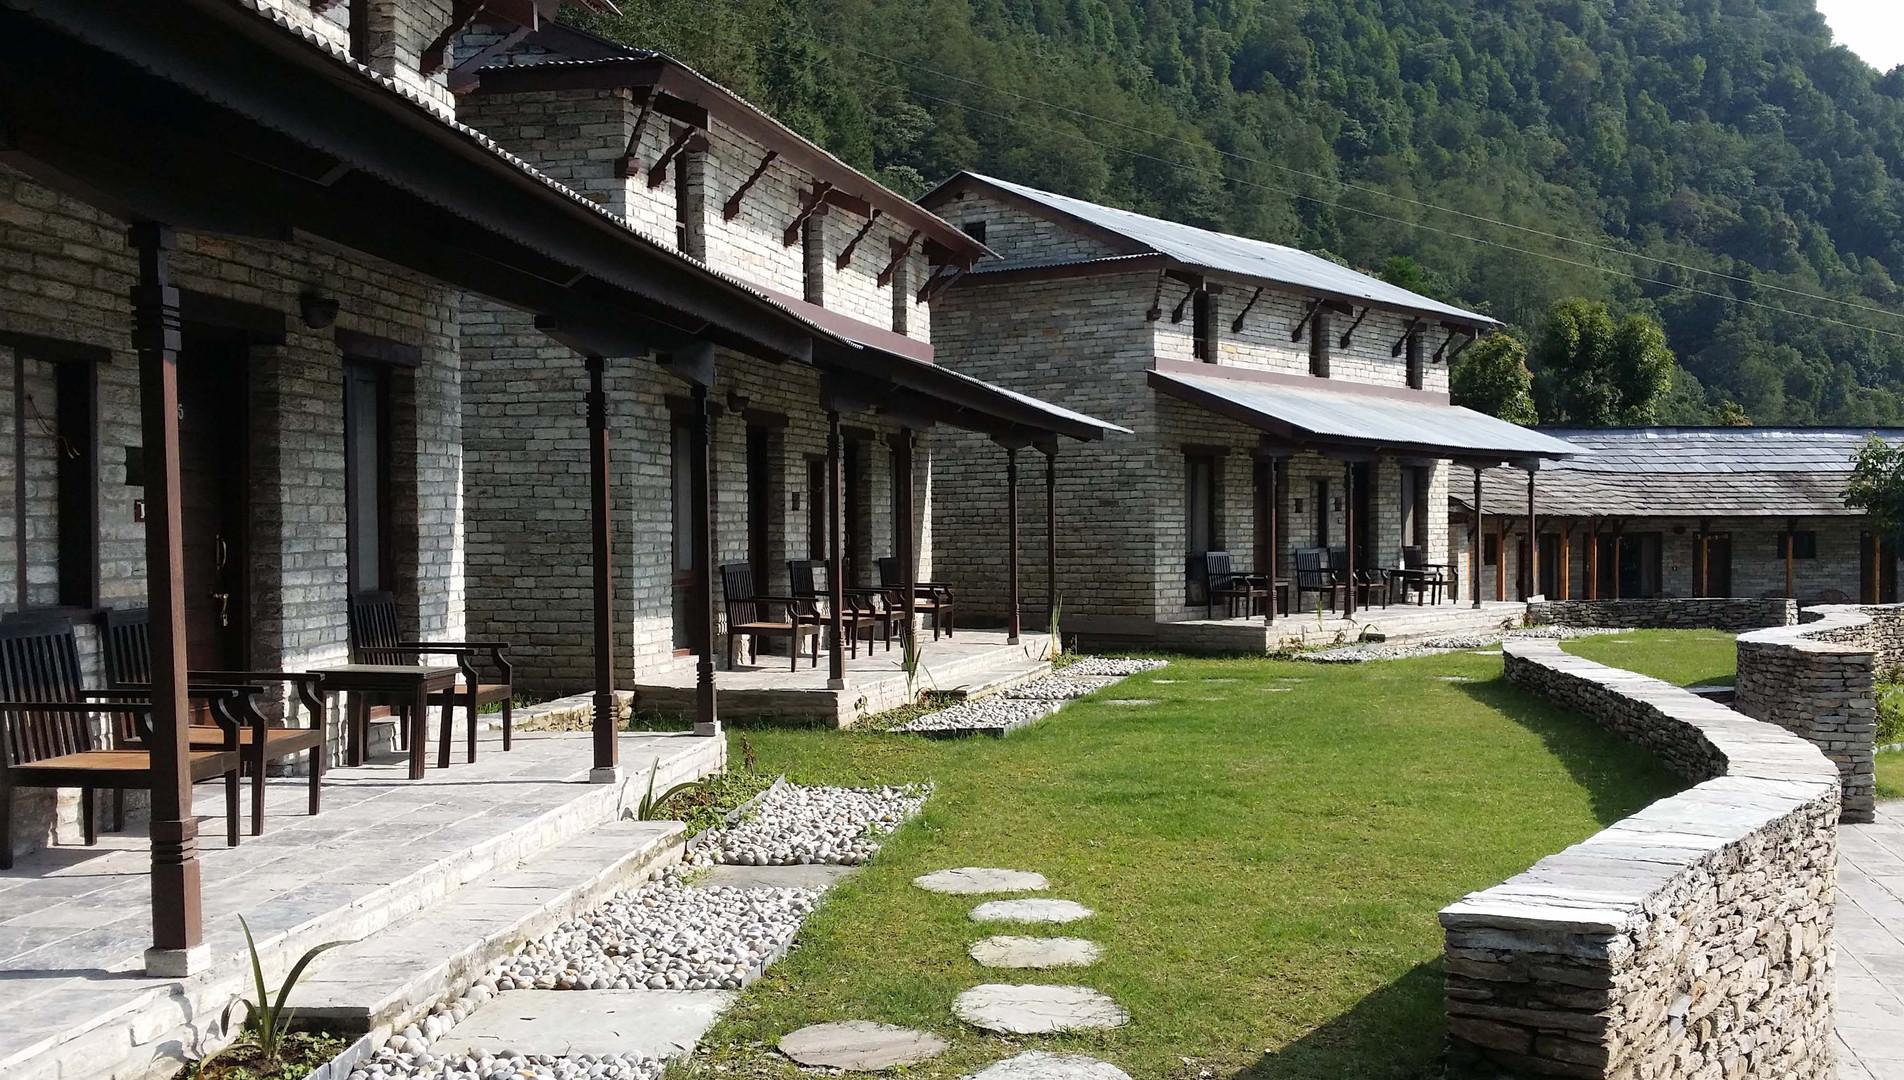 Experiential tour trekking lodge